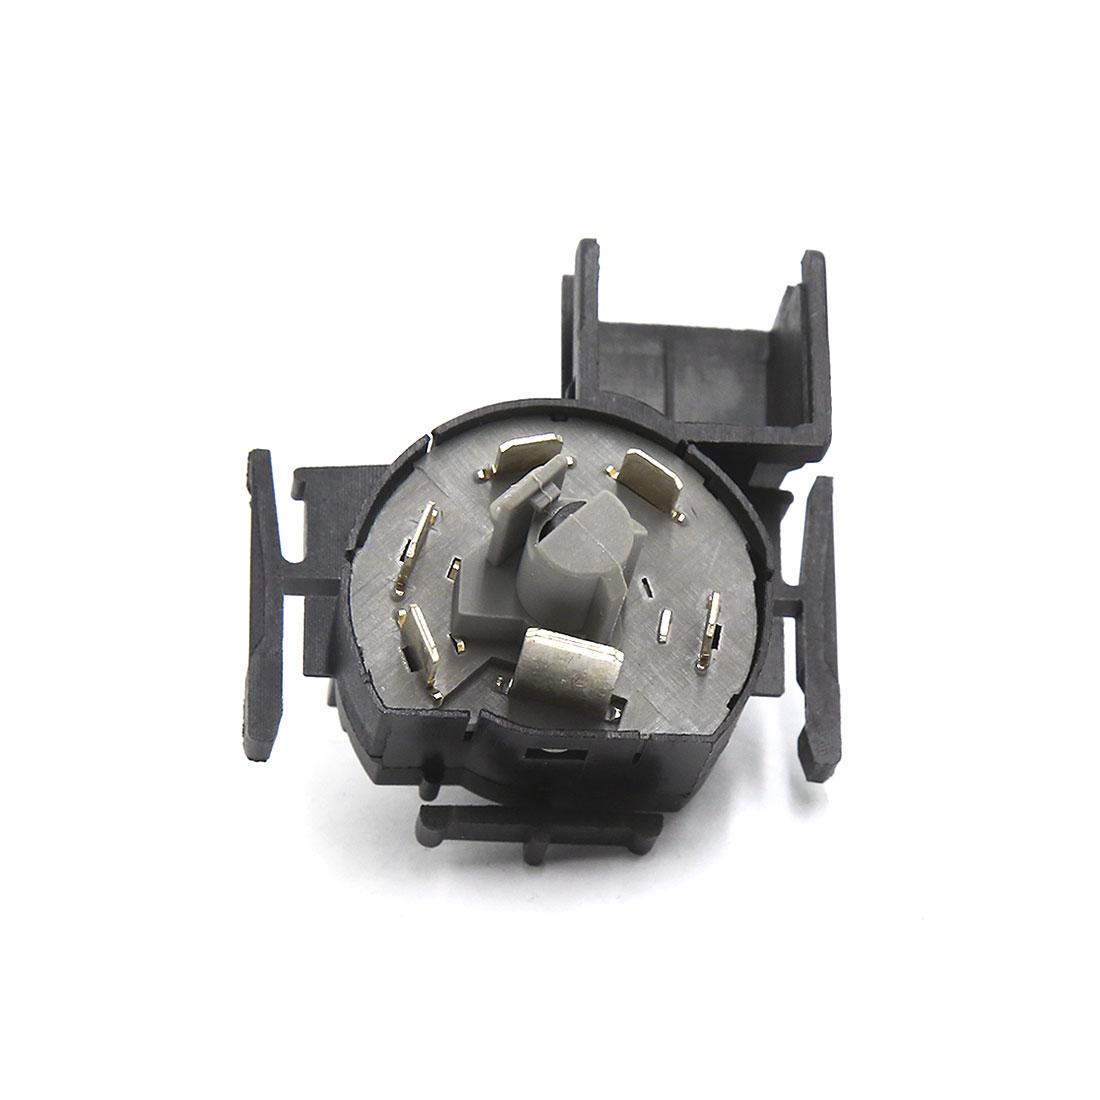 Ignition Switch 90589314 Fit for Vauxhall Astra MK4 MK IV (G) DTI 16V 1998-2005